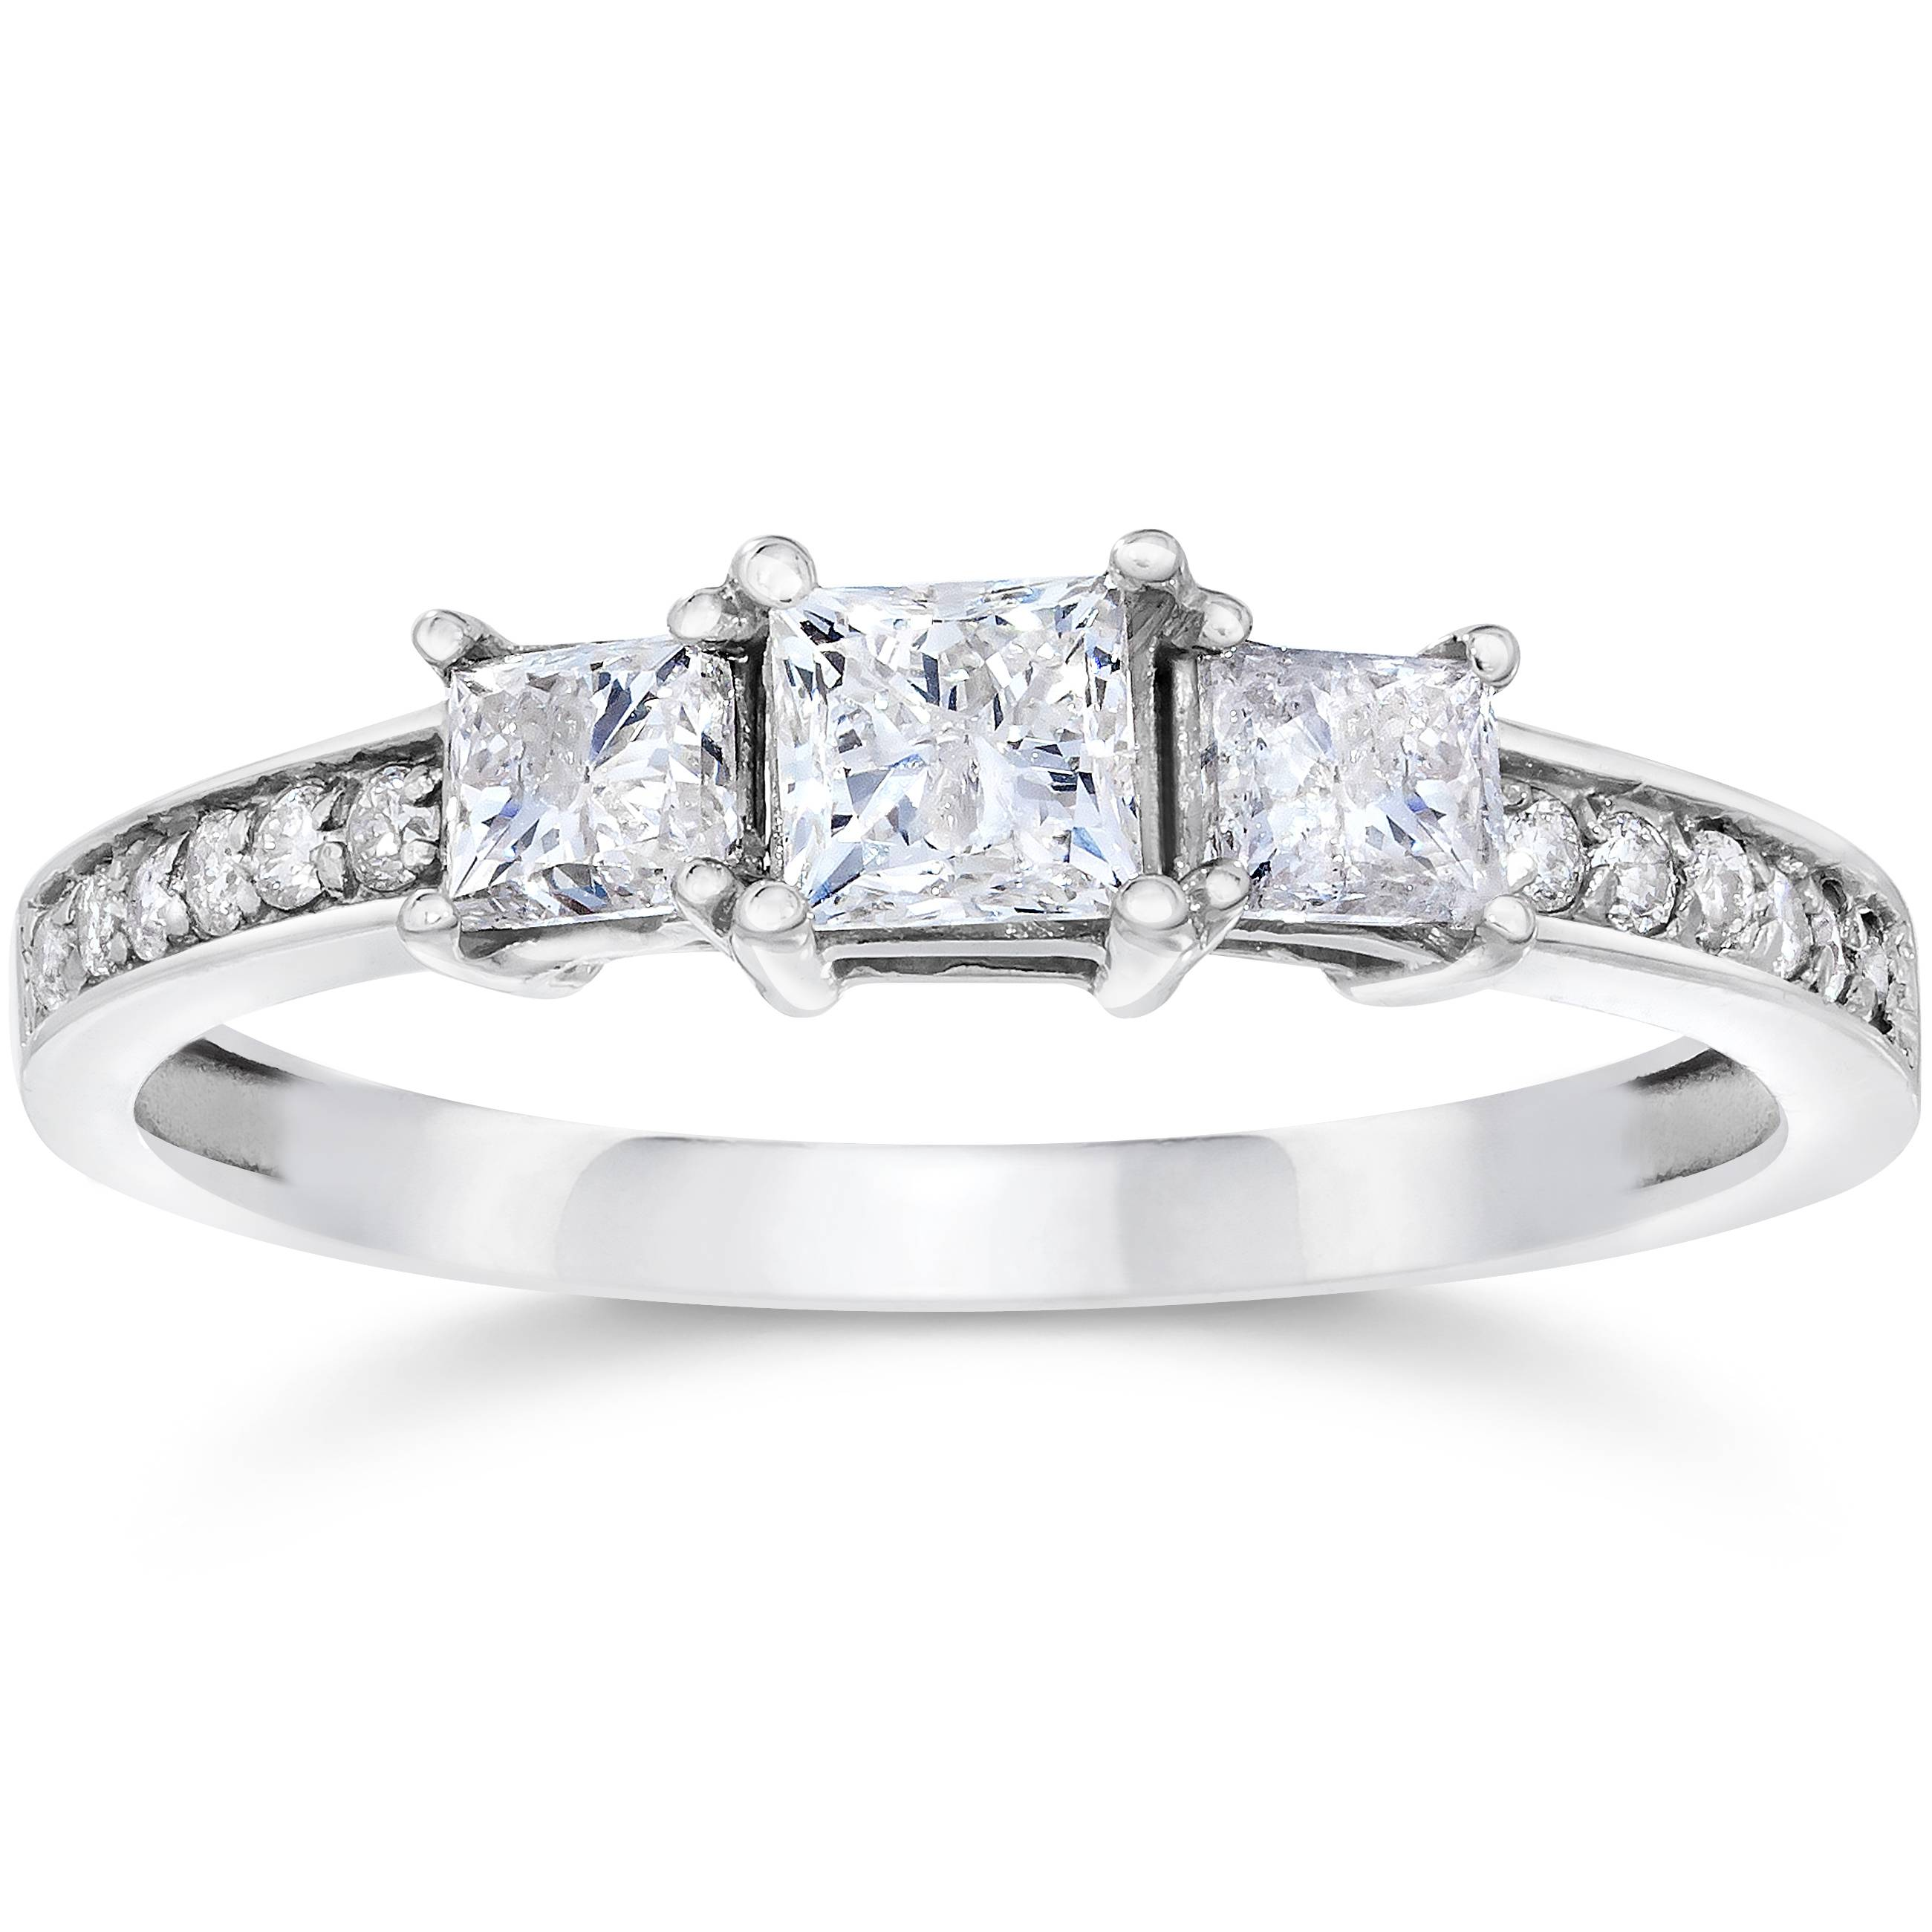 1/2ct Three Stone Princess Cut Diamond Engagement Ring 14K ...